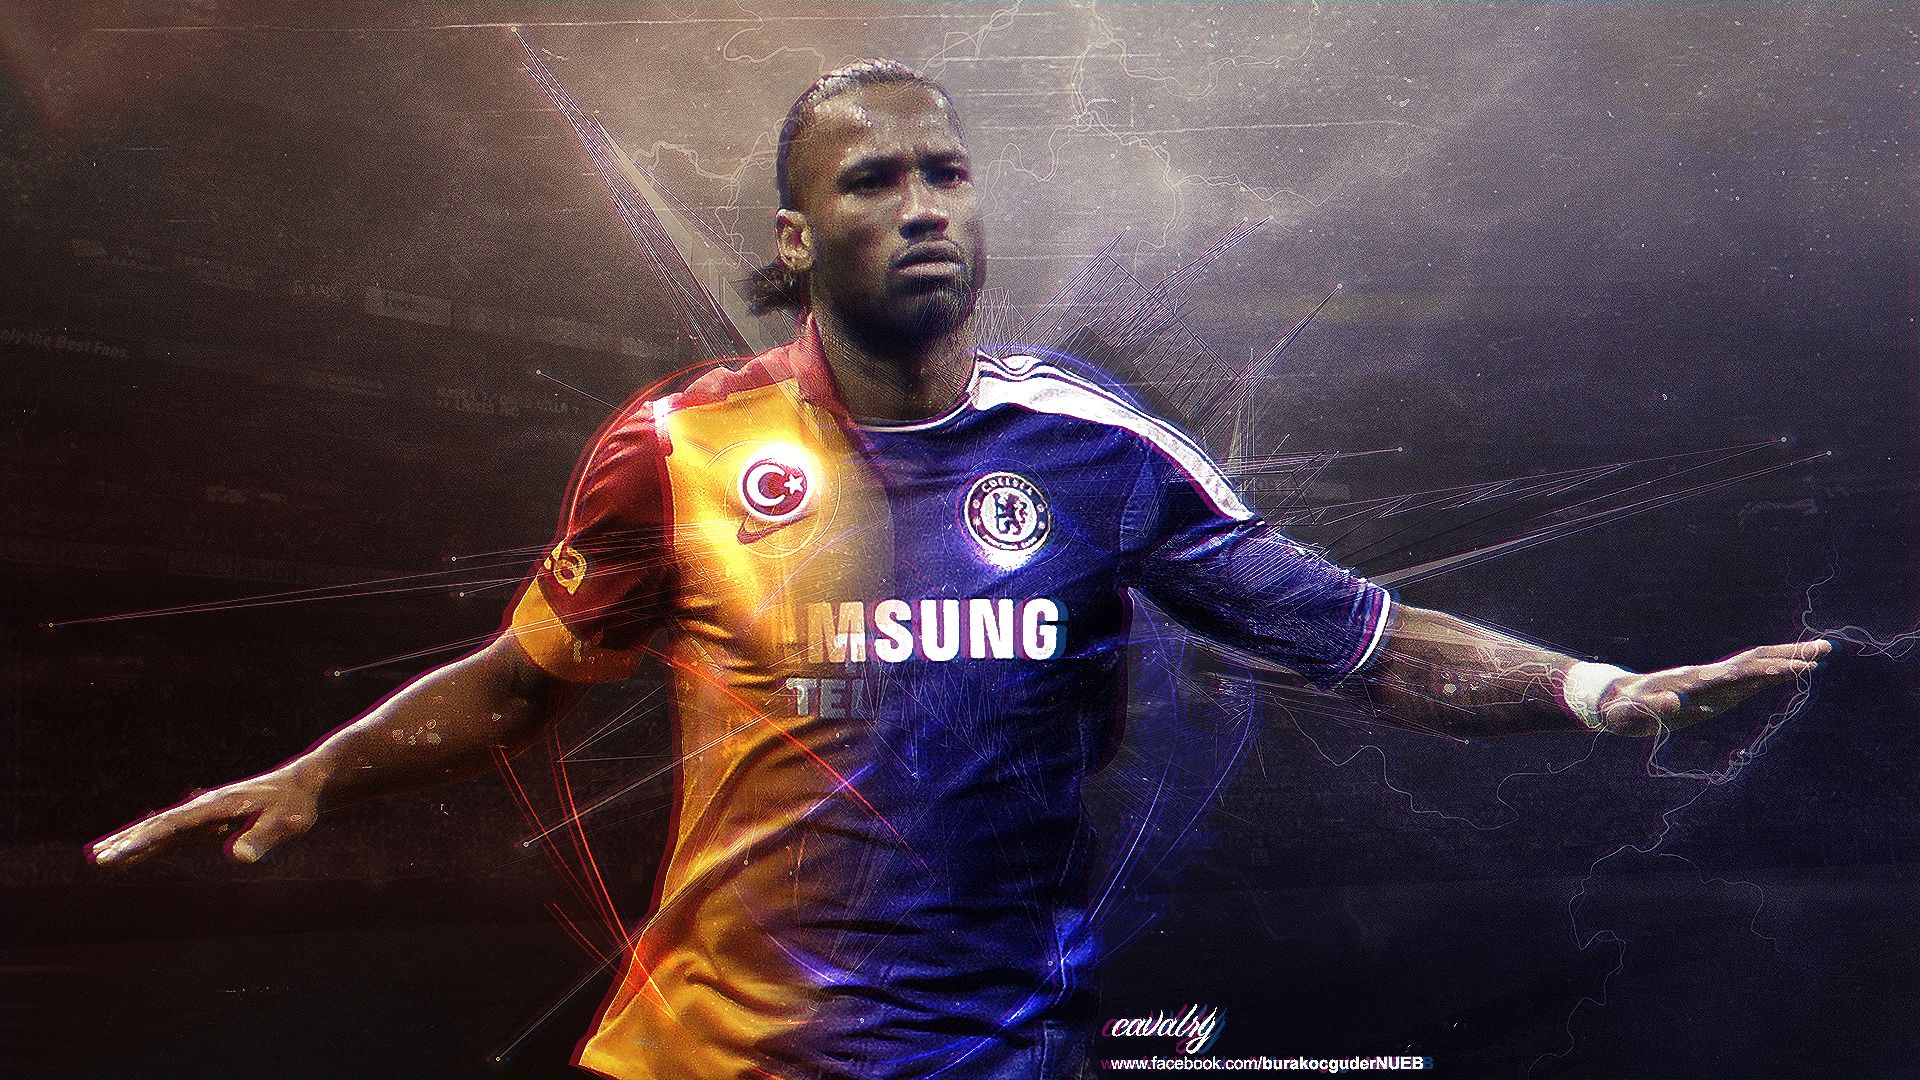 Didier Drogba Chelsea Legend Wallpaper Football Wallpapers Hd